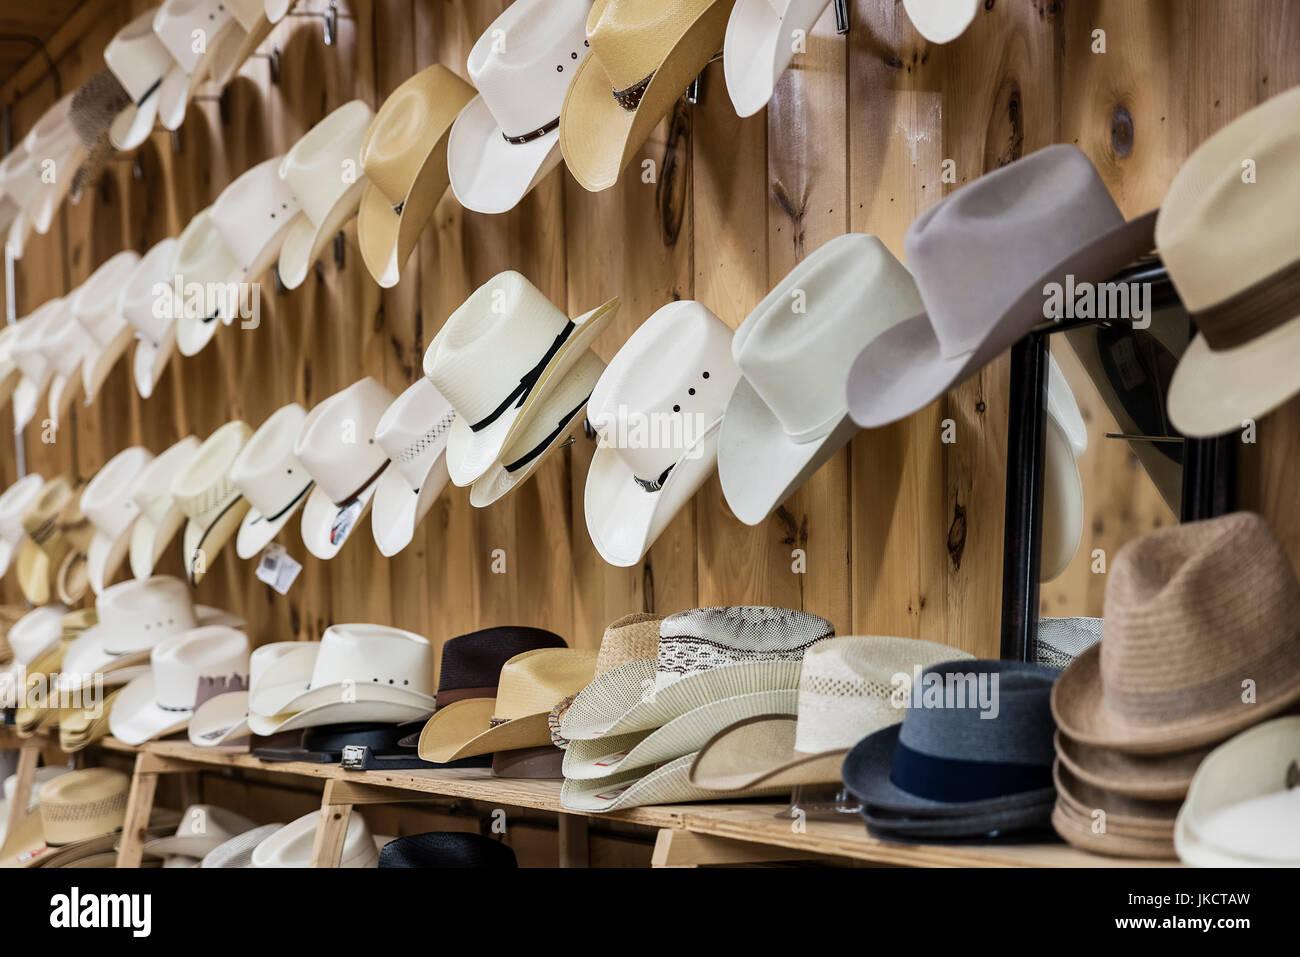 Store cowboy hat display. - Stock Image